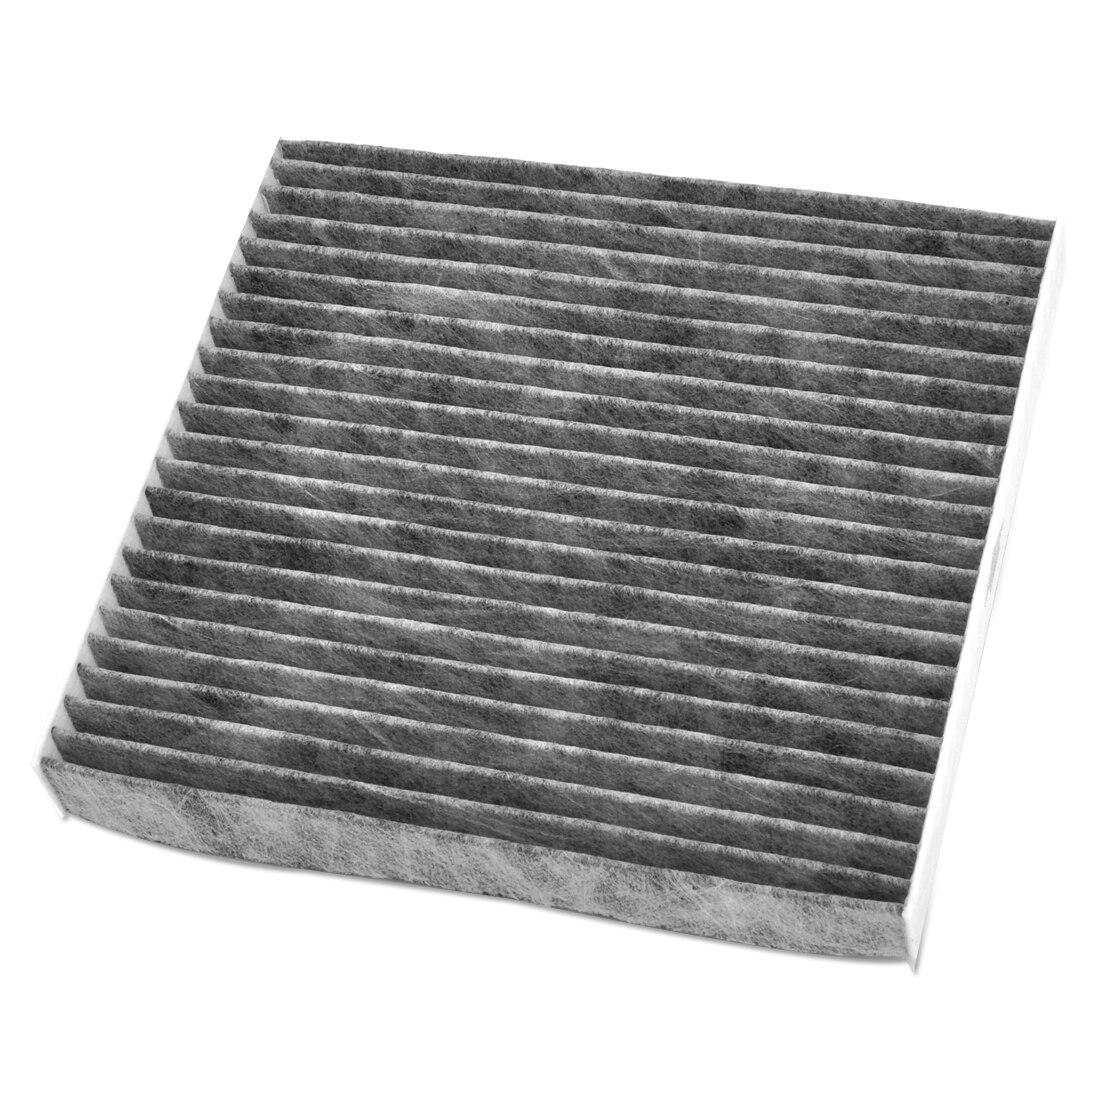 Citall carbon fiber cabin air filter gj6b 61 p11 gj6a 61 p11